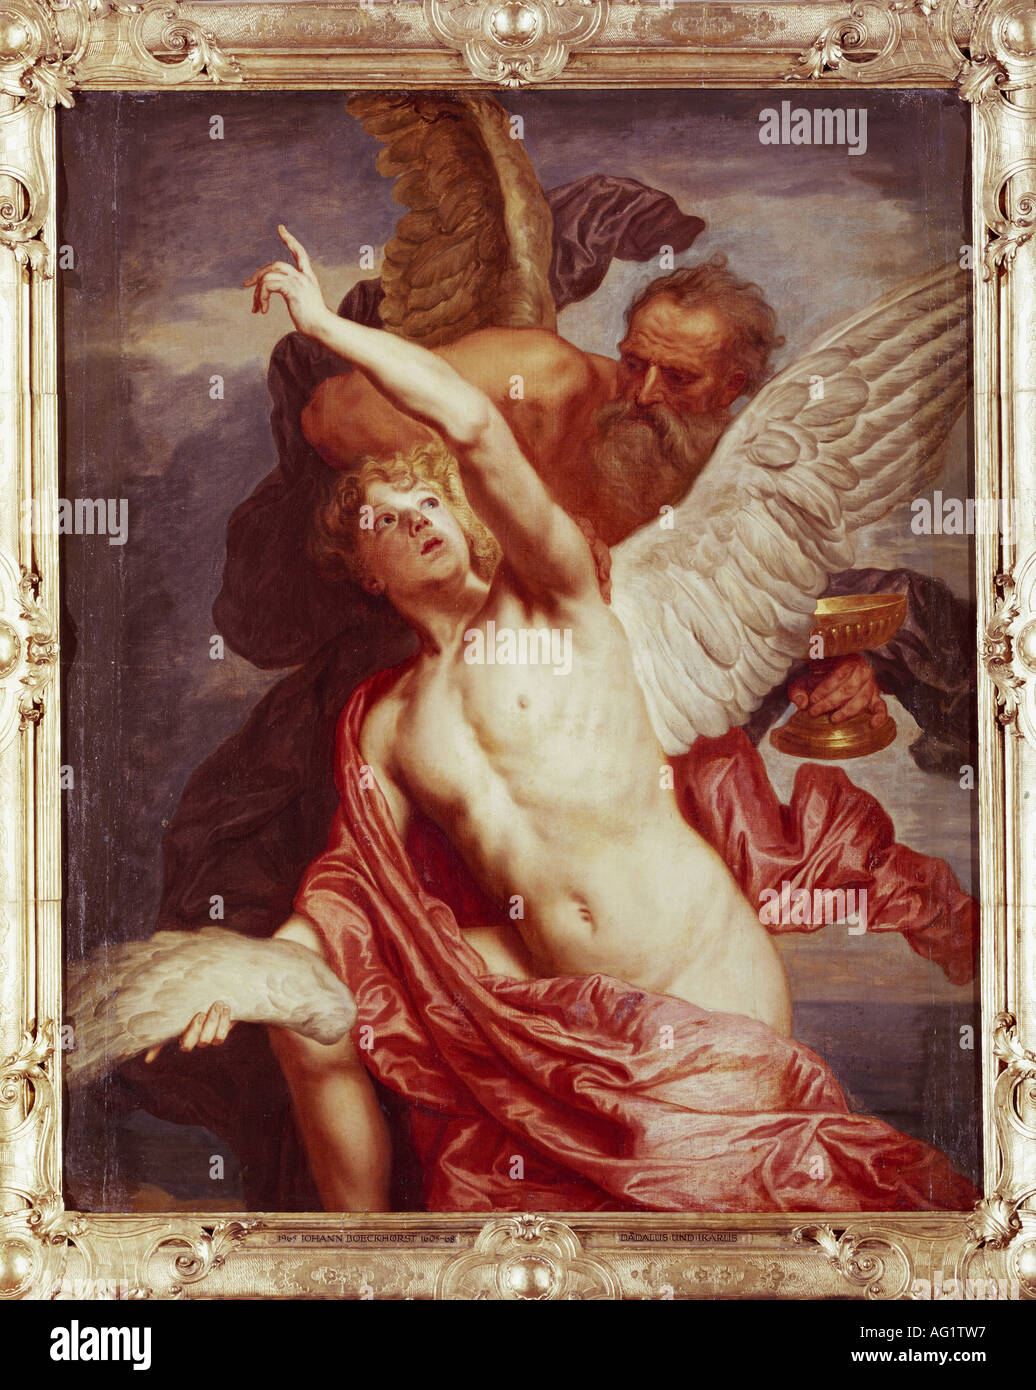 'fine arts, Boeckhorst, Jan van, (1605 - 1668), painting, 'Daedalus and Icarus', Schleißheim castle, Munich, Germany, Europe, - Stock Image